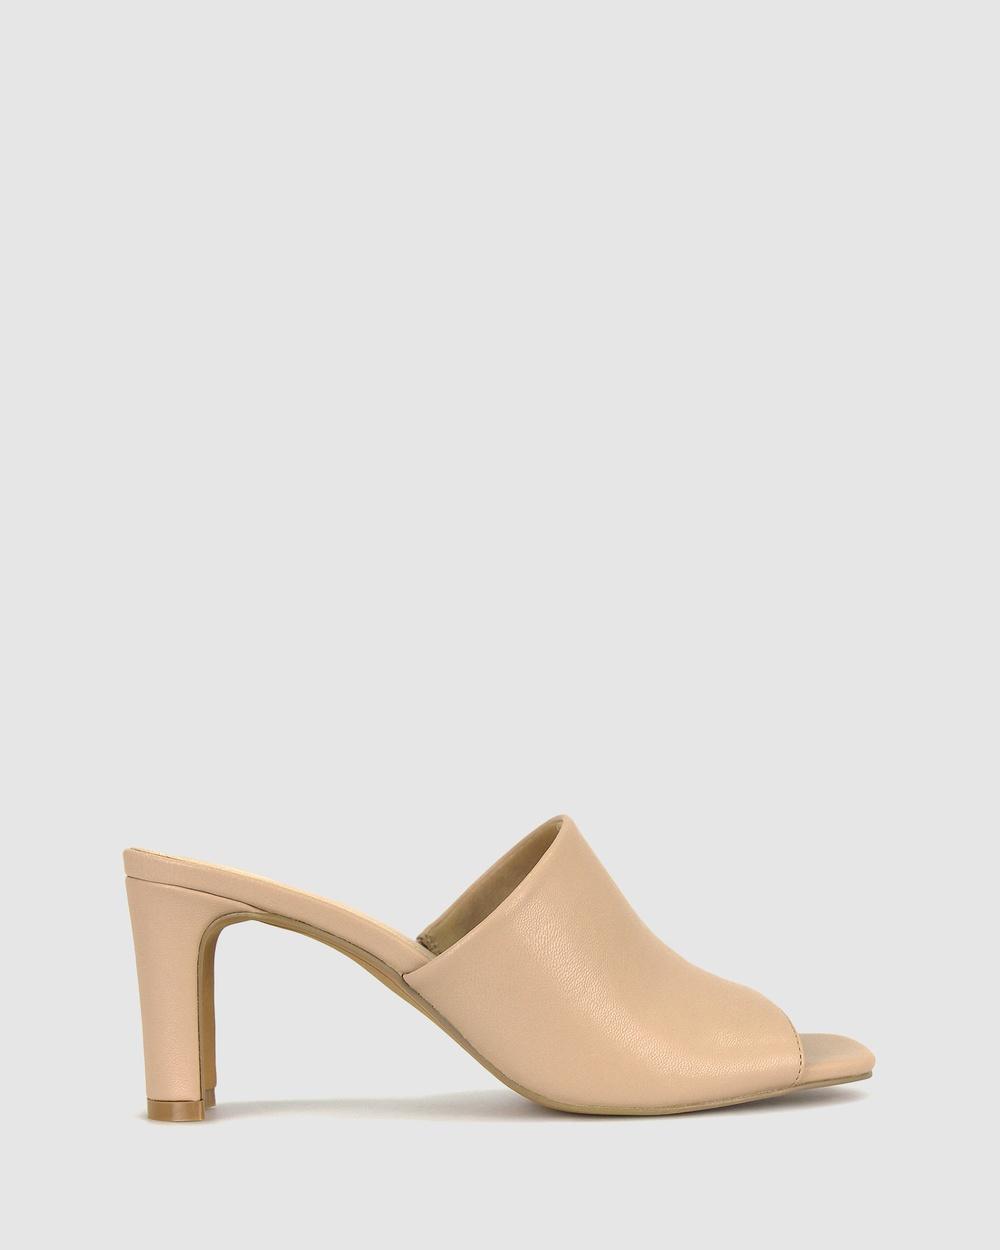 Betts Kara Square Toe Mules Sandals Nude